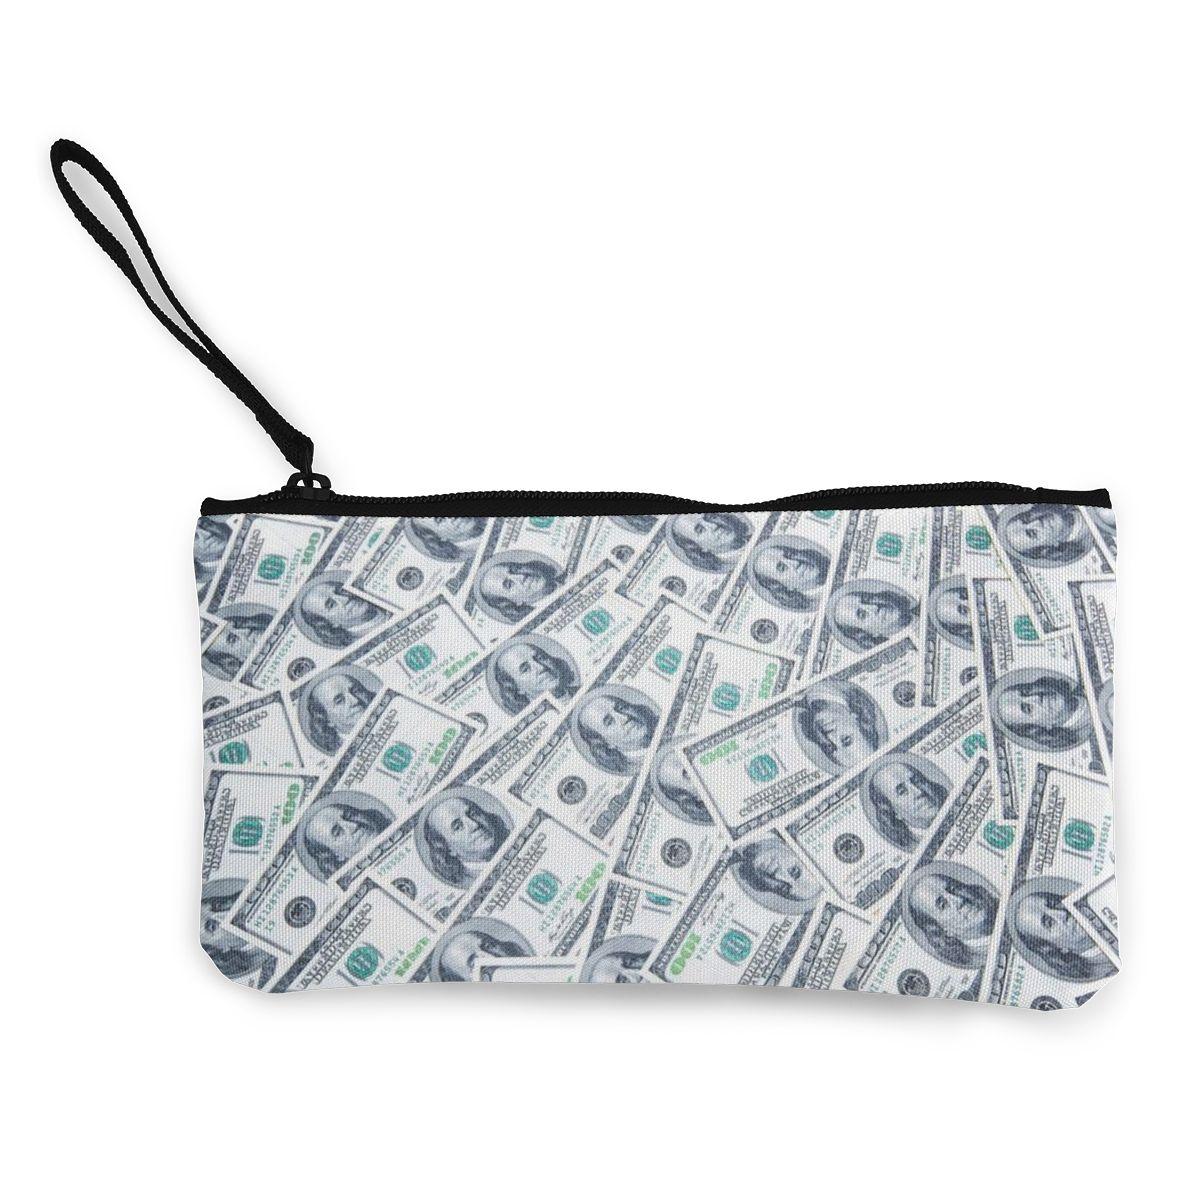 Coin Purse Mini Small Women Bag Canvas Small Cute Pouch Coin Kids Girls Wallet Clutch Girls Small Change Purse Custom Bolsa